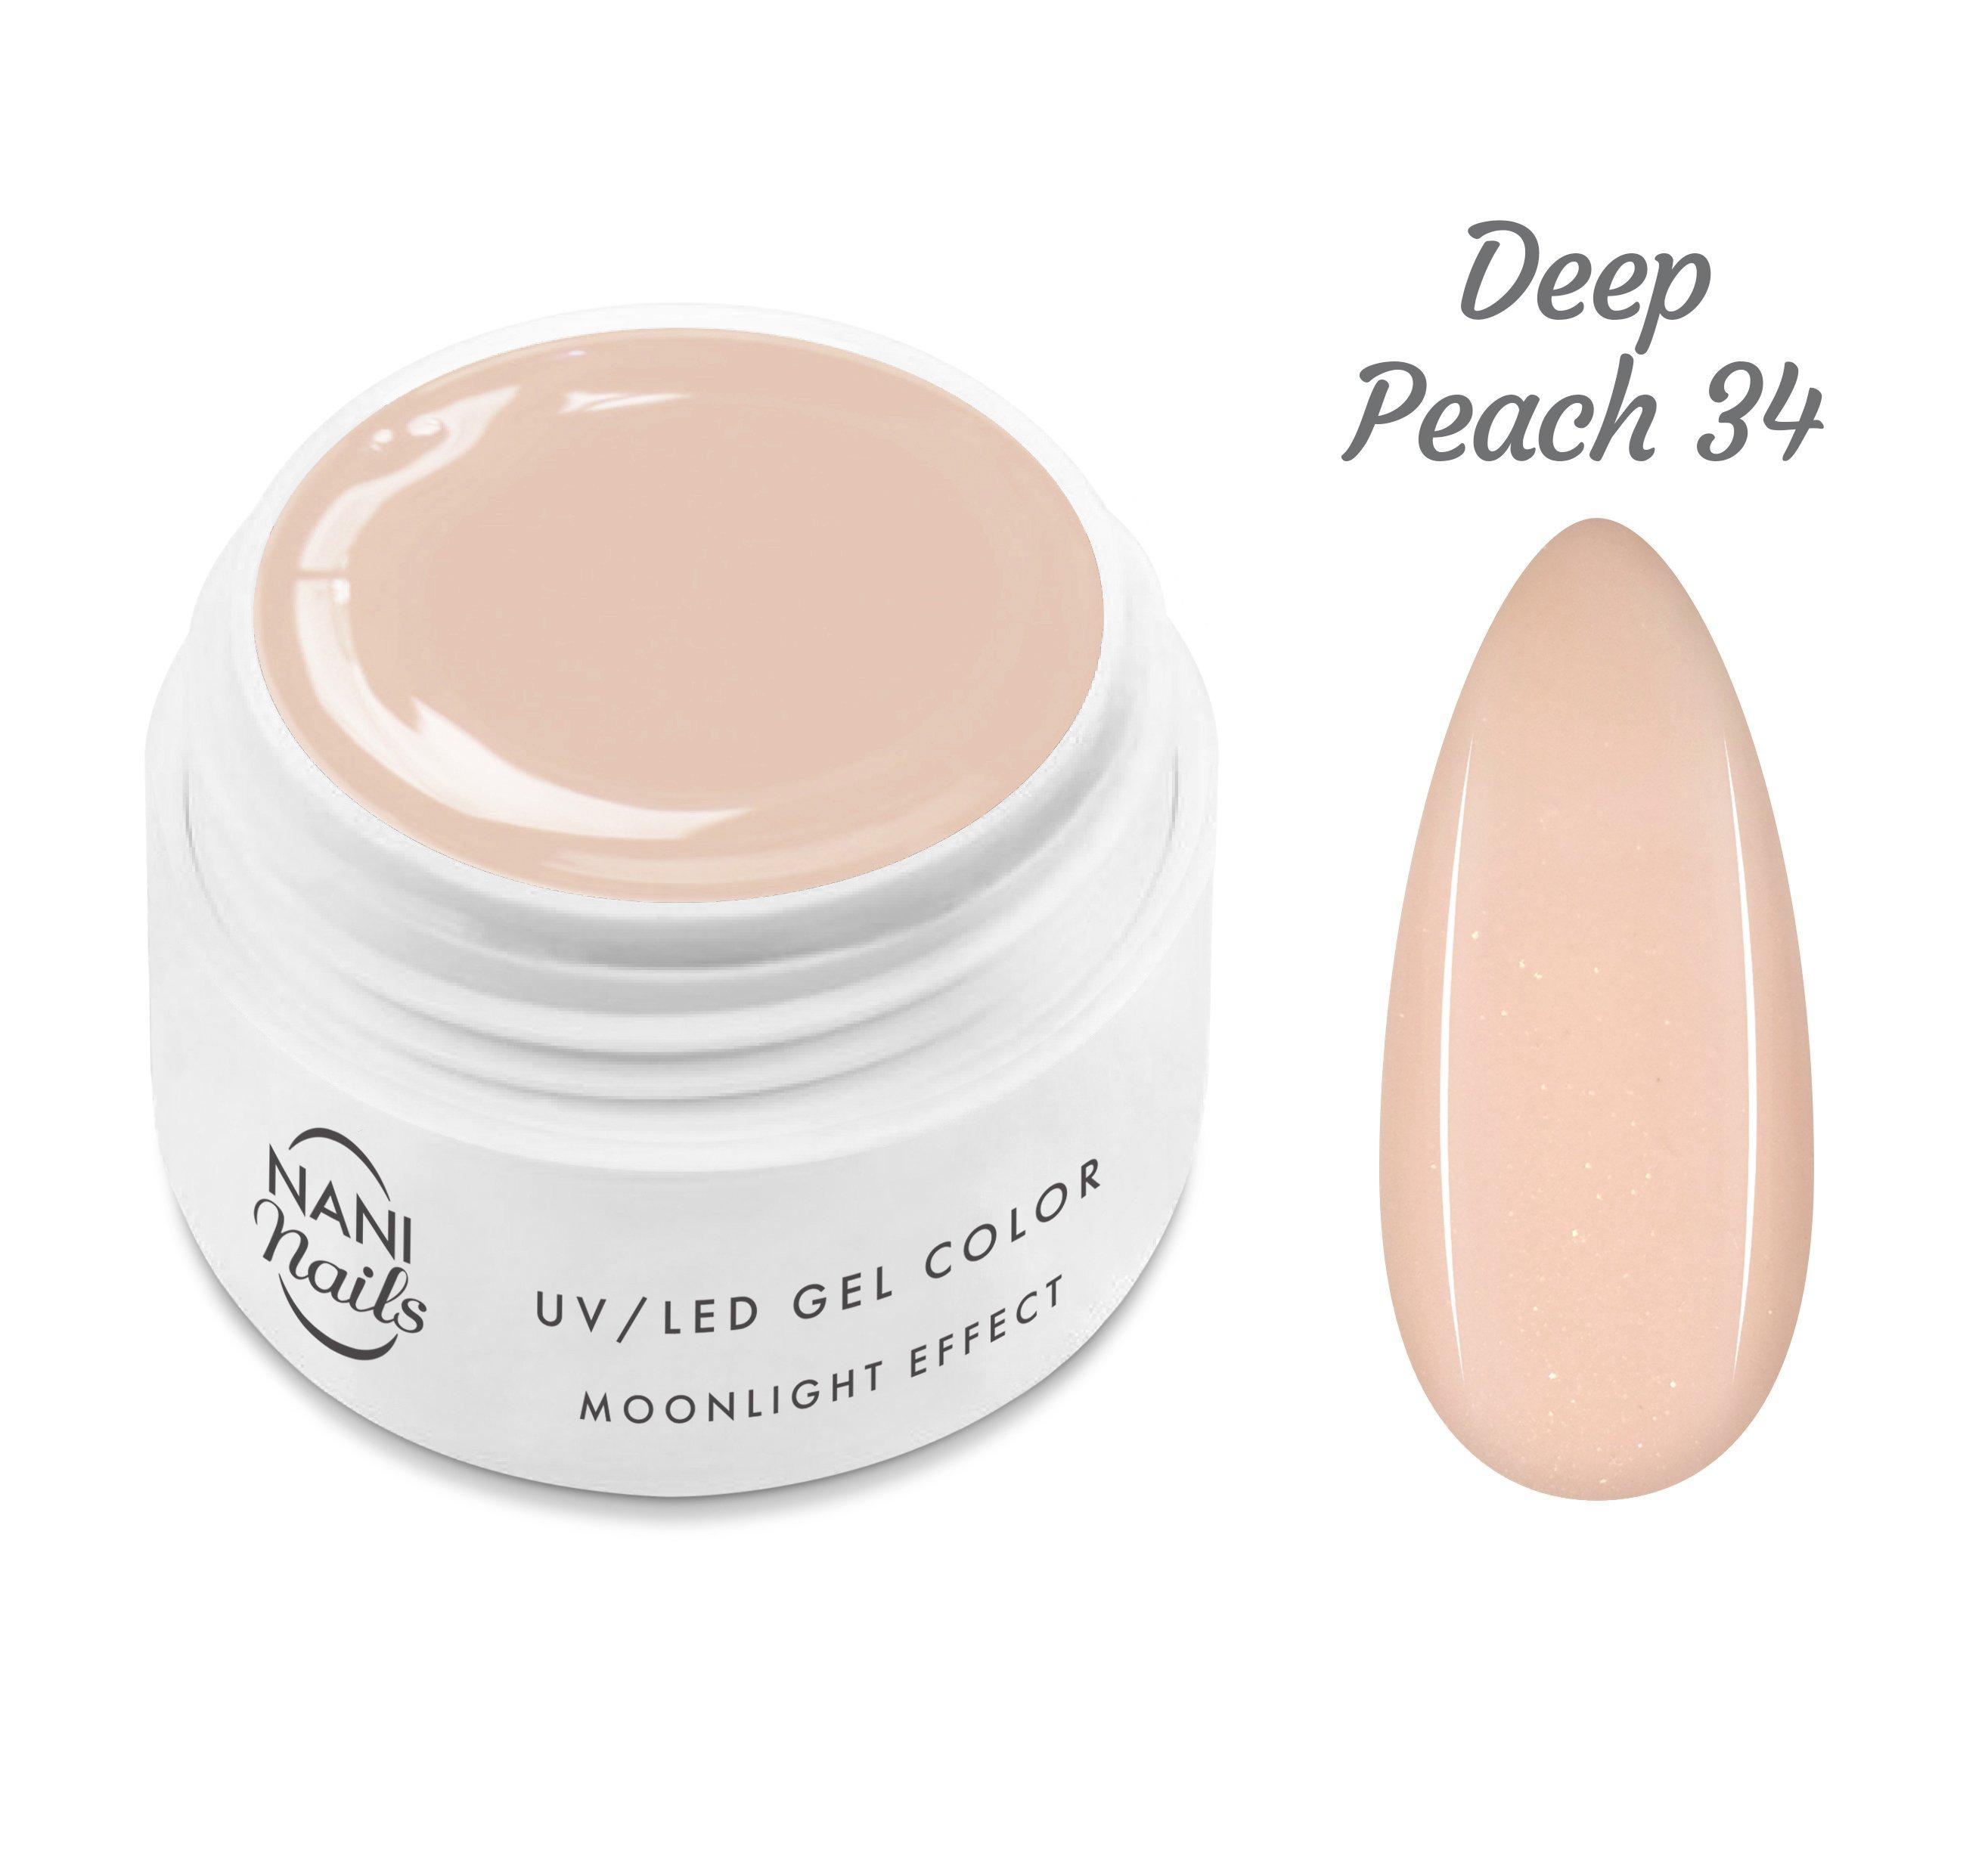 NANI UV gél Moonlight Effect 5 ml - Deep Peach